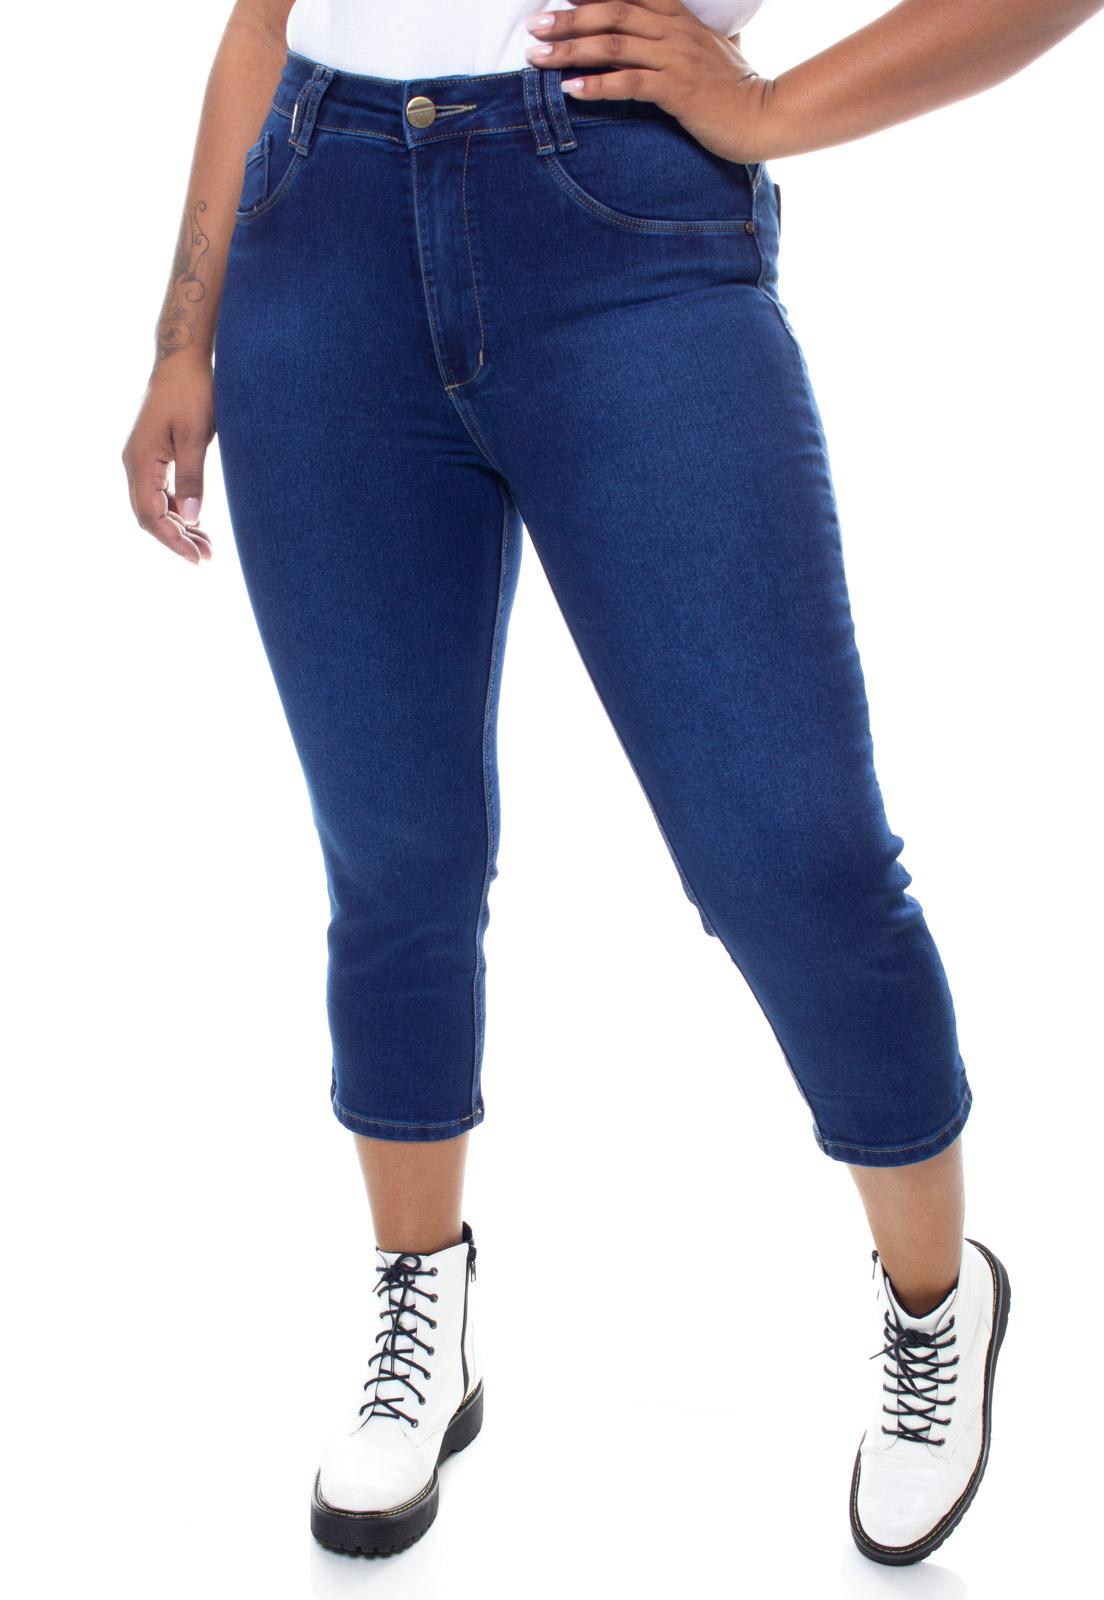 Calça Jeans Plus Size Feminina Capri Crocker - 47770  - CROCKER JEANS